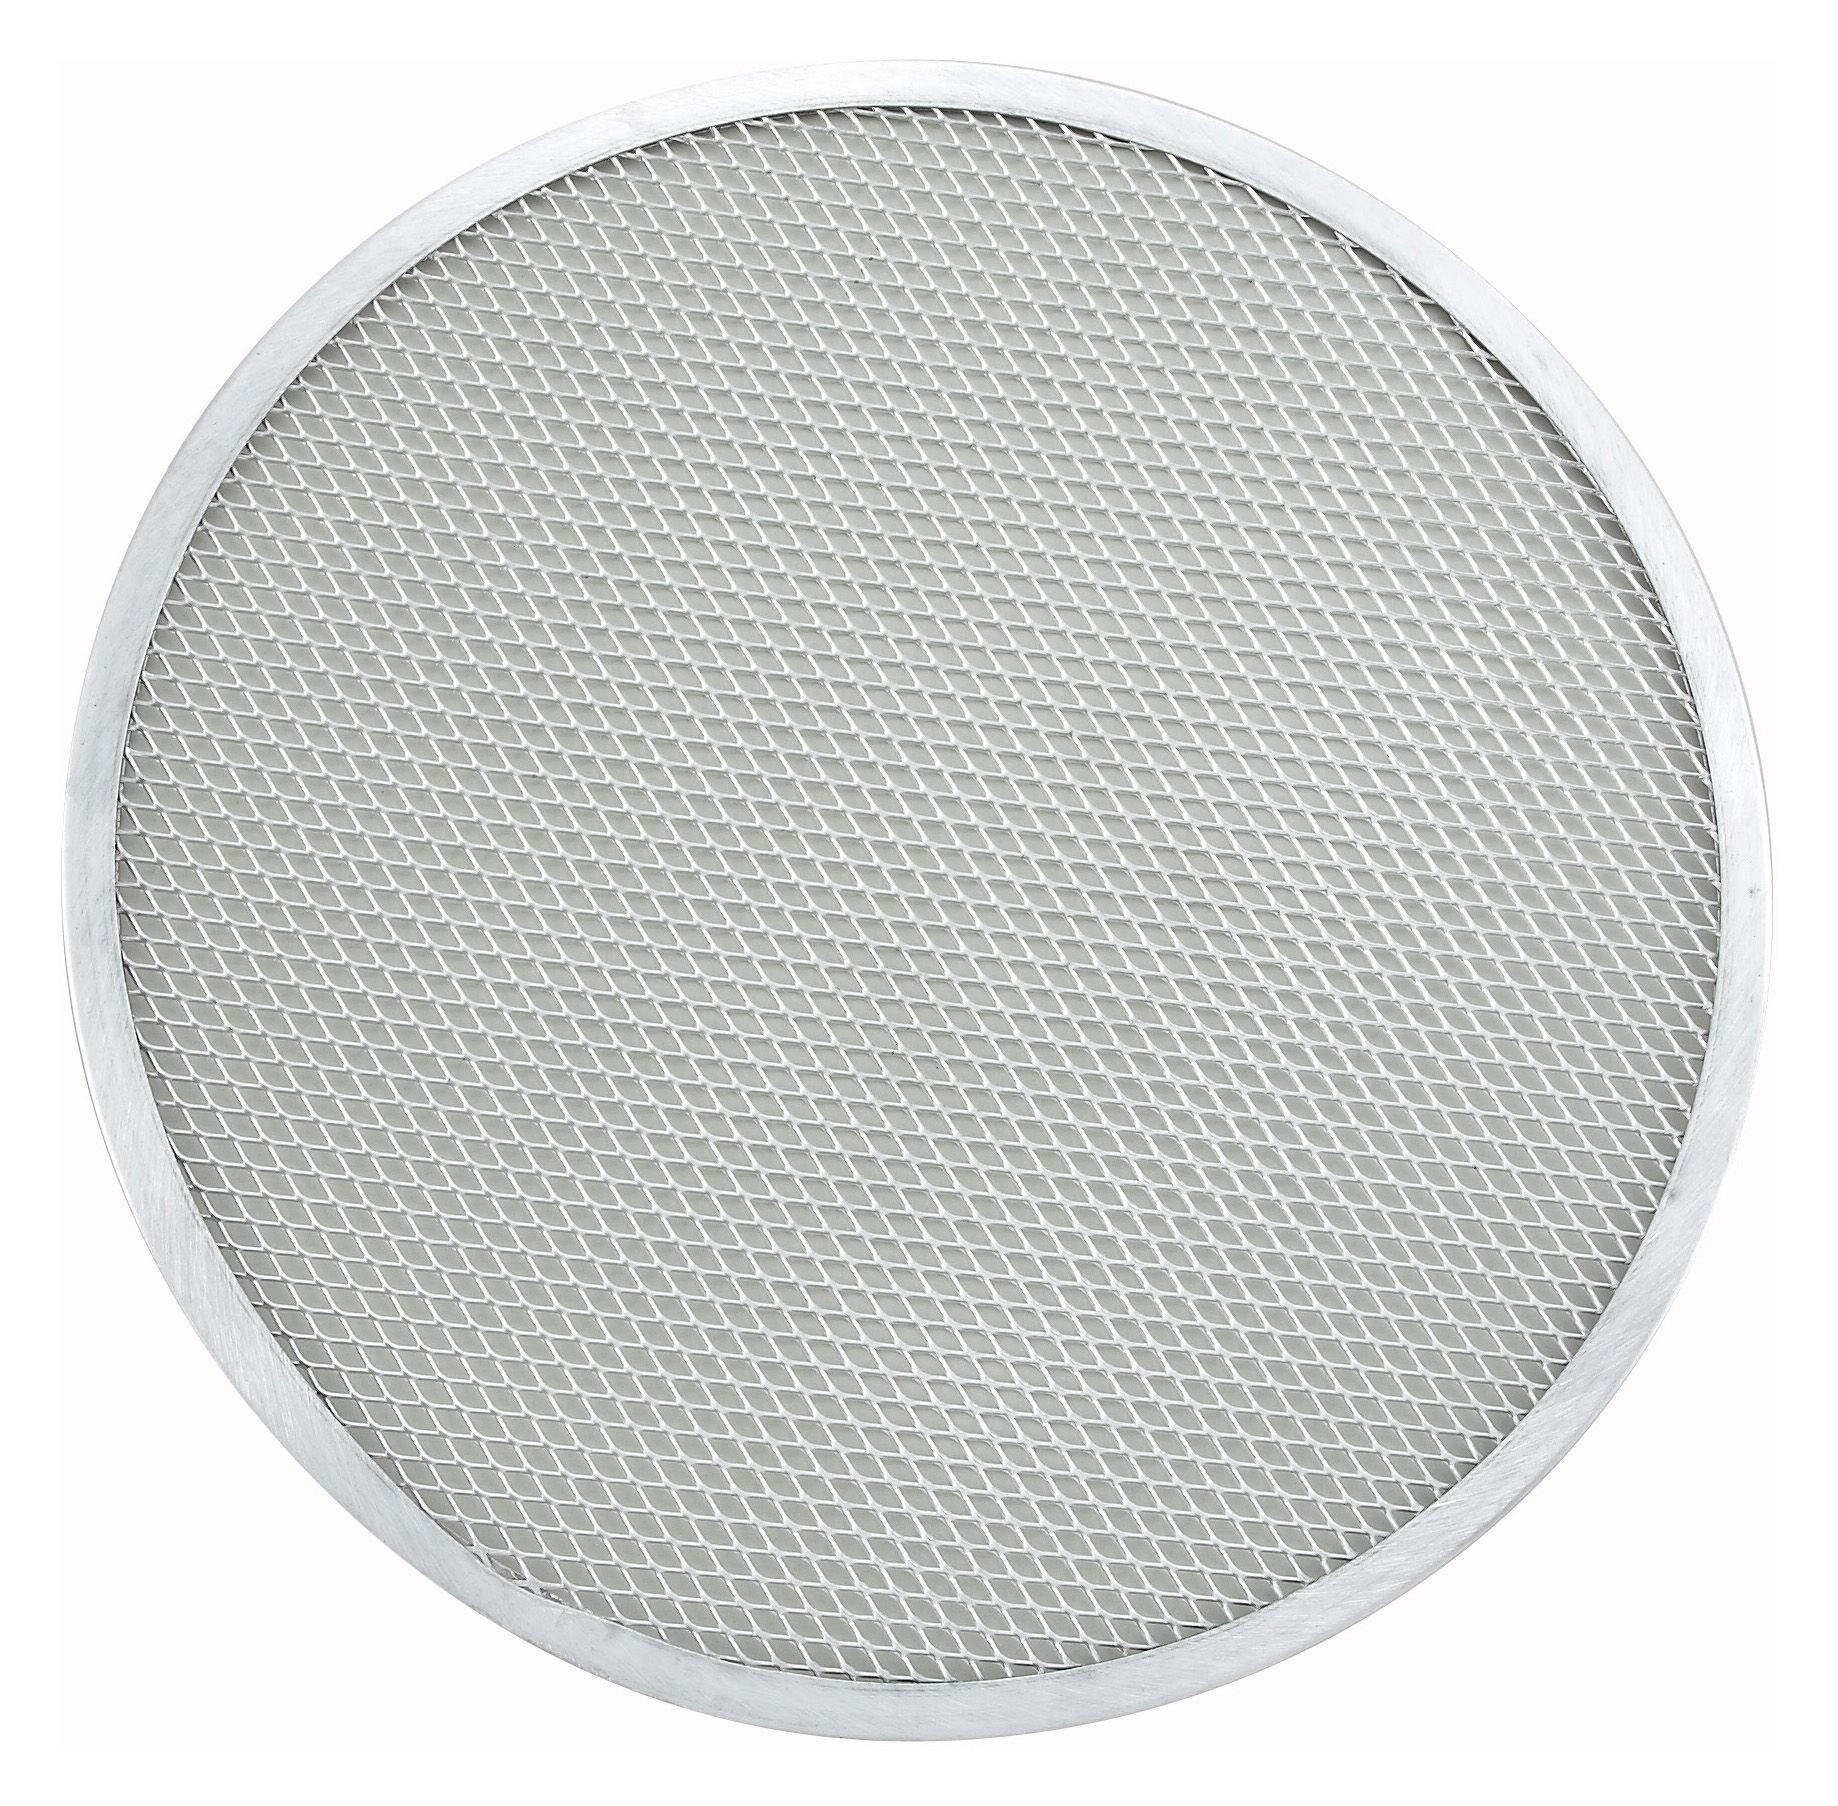 "Winco APZS-15 Seamless Aluminum Pizza Screen 15"" Dia."